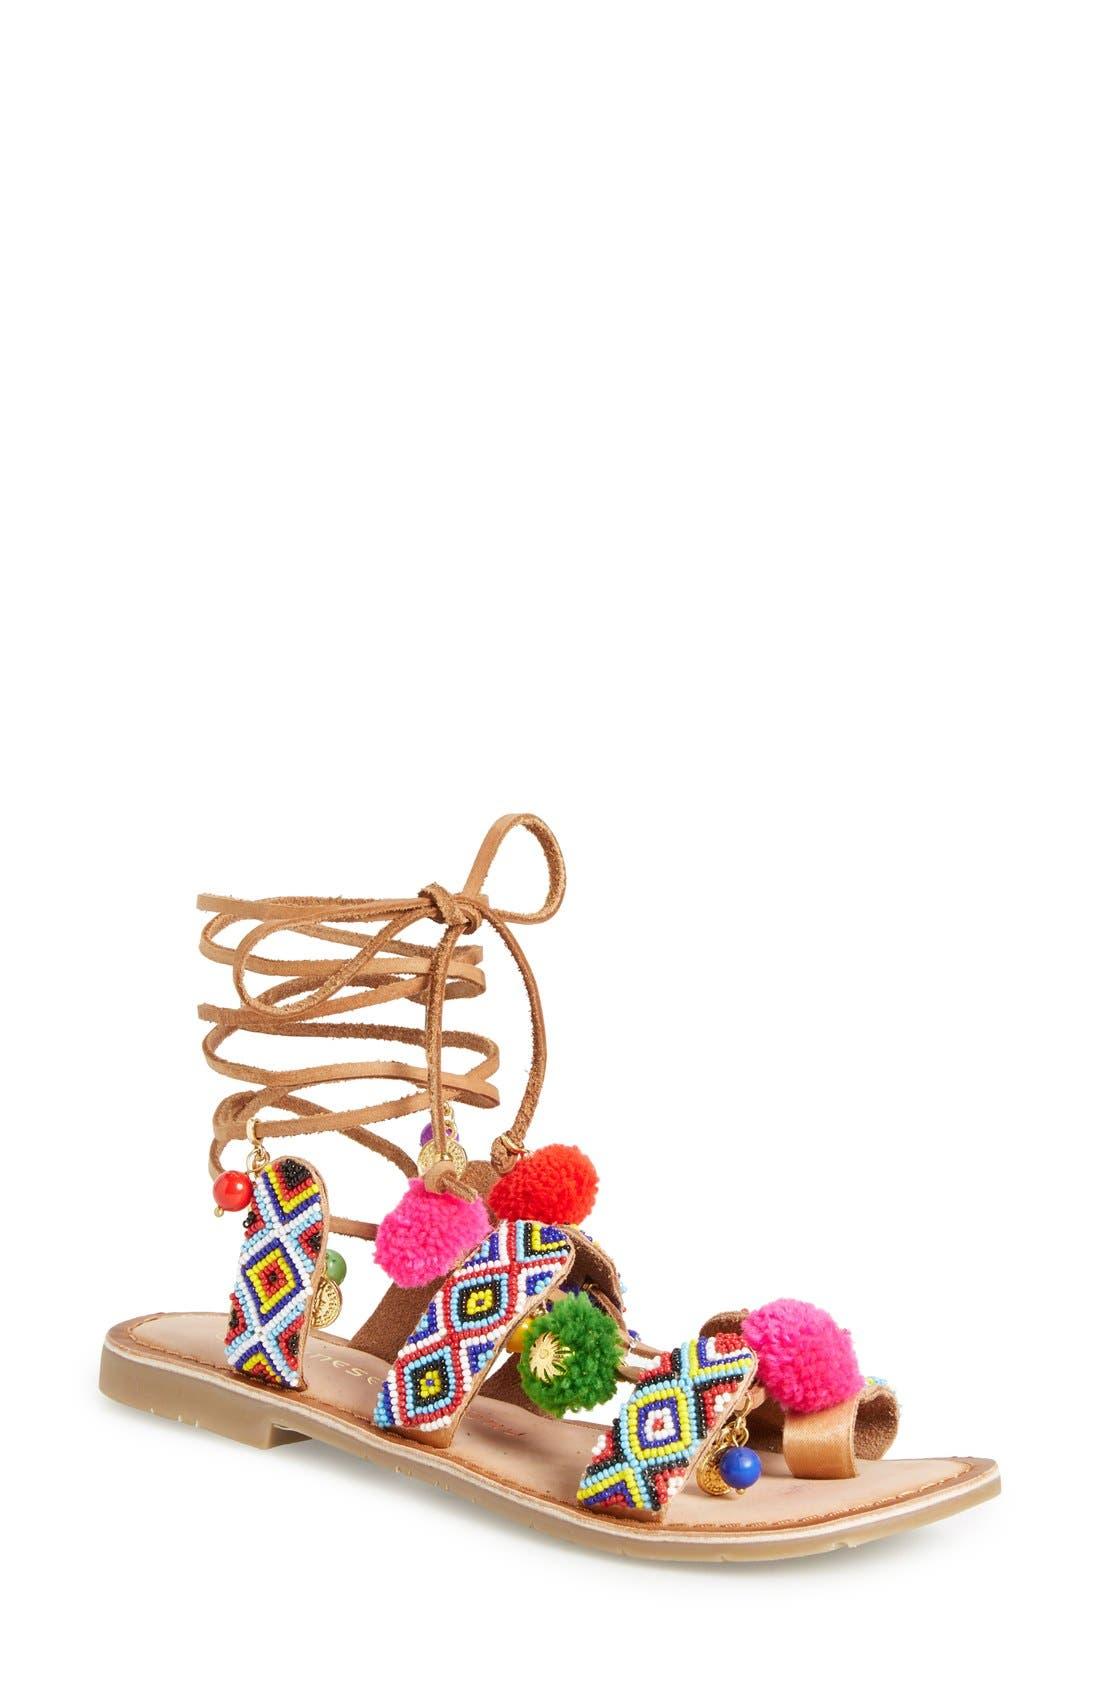 CHINESE LAUNDRY, 'Posh' Embellished Lace-Up Sandal, Main thumbnail 1, color, 218